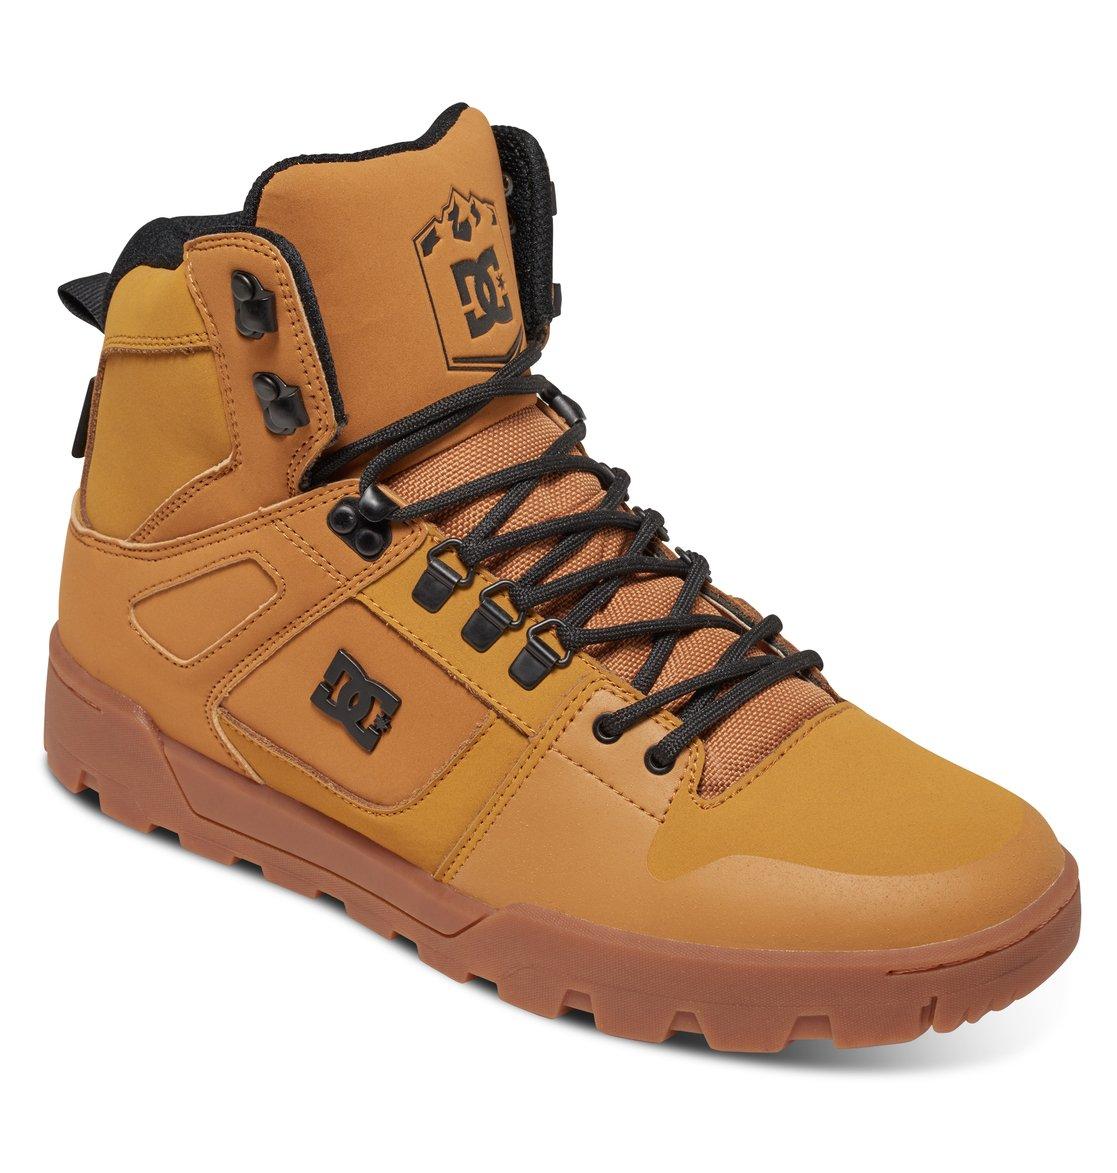 Spartan High Boots Mountain Boot Adyb100001Dc Shoes LqSVpGUzM